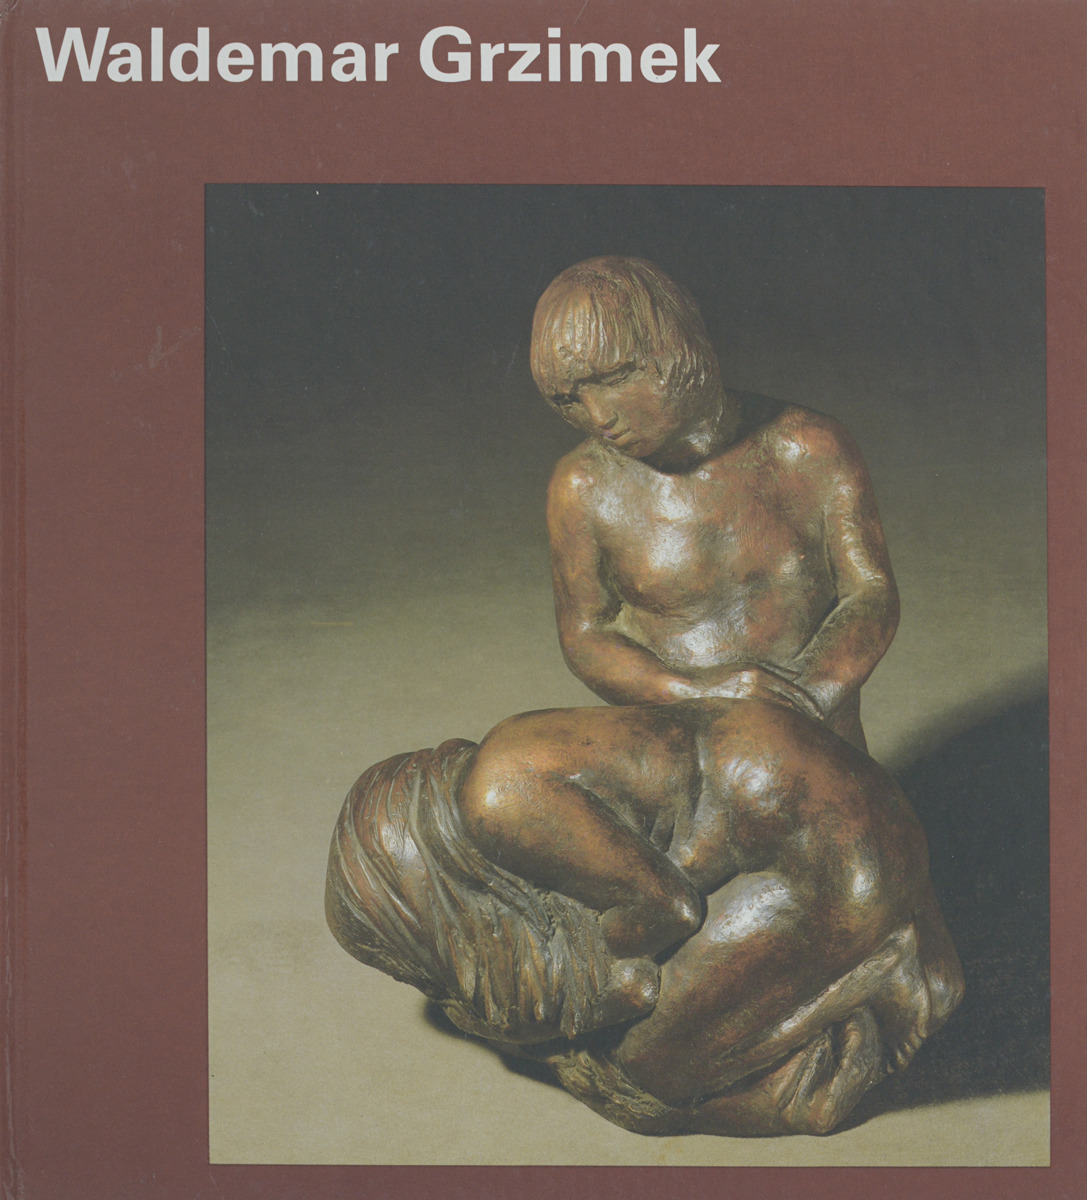 Raimund Hoffmann Waldemar Grzimek